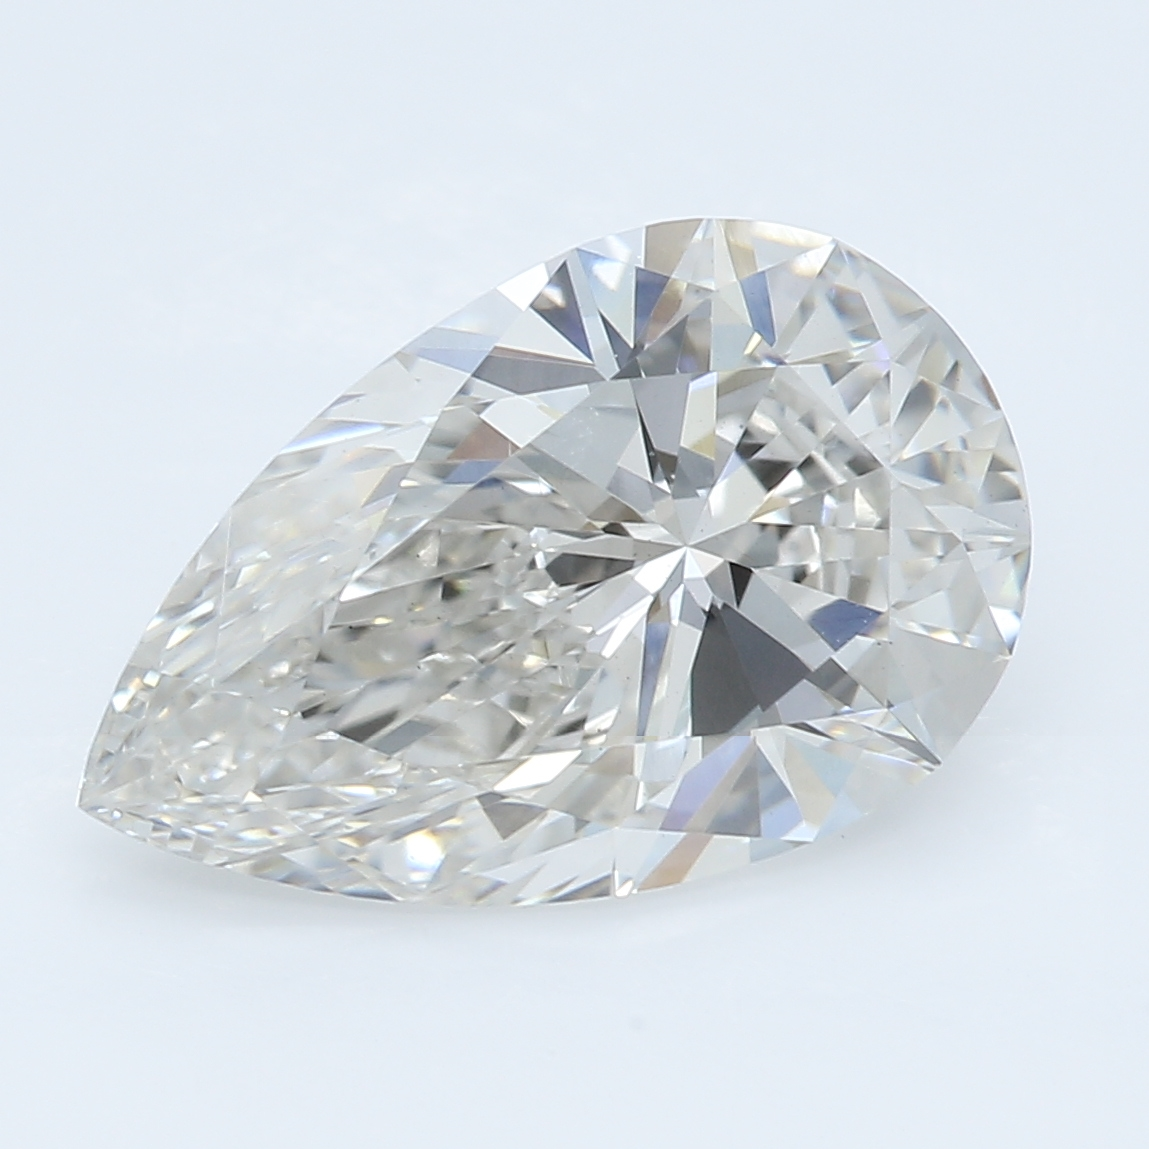 2.26 Carat I-VS1 Ideal Pear Diamond